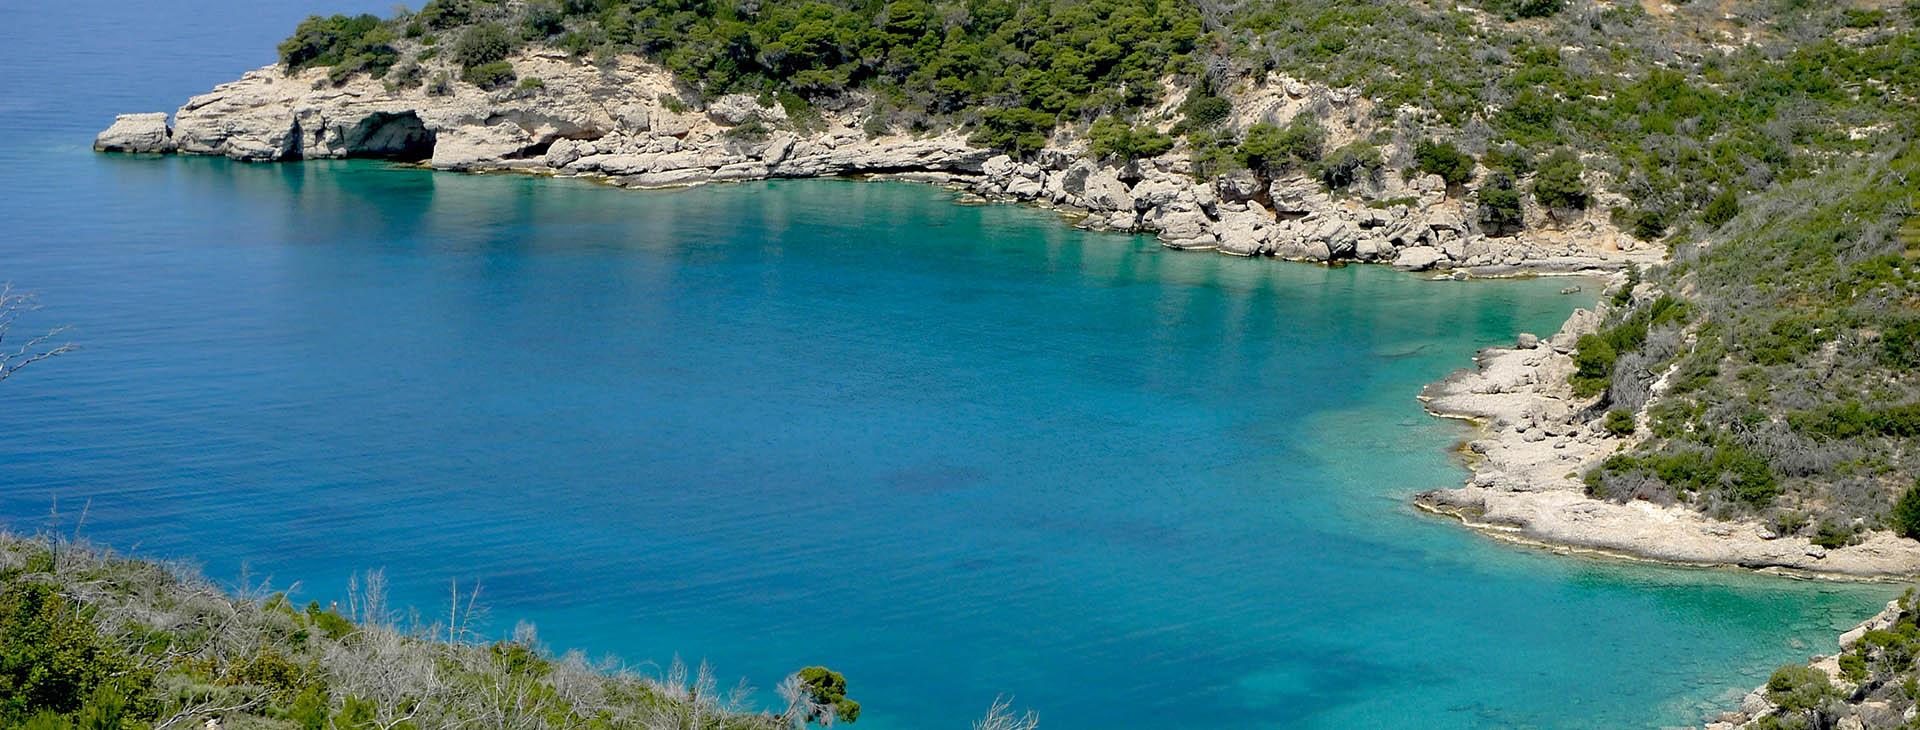 Beach at Spetses island